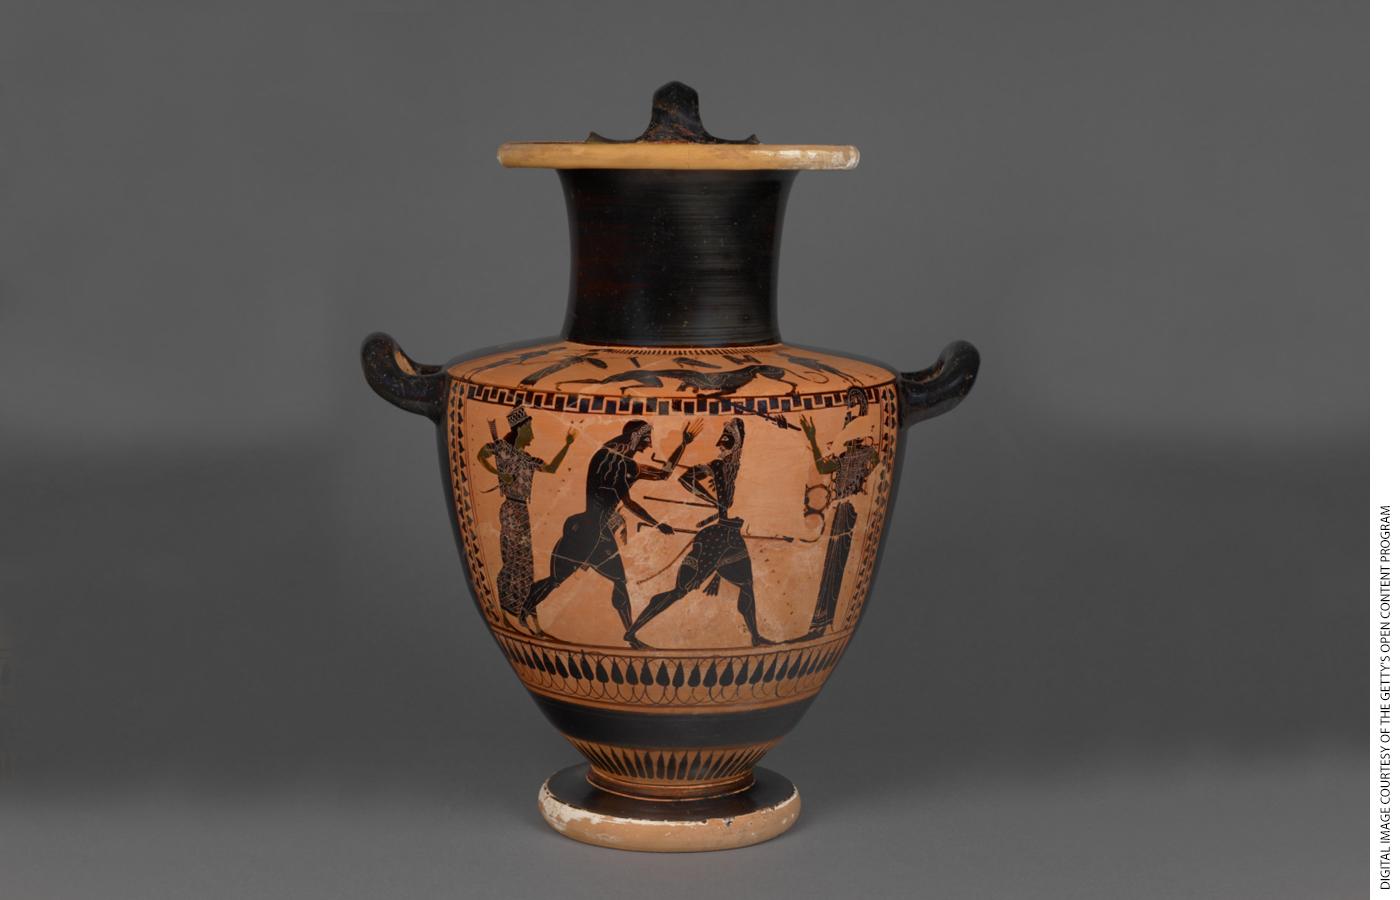 """Attic Black-Figure Hydria,"" Lykomedes Painter, Athens, Greece, 520–510 B.C."